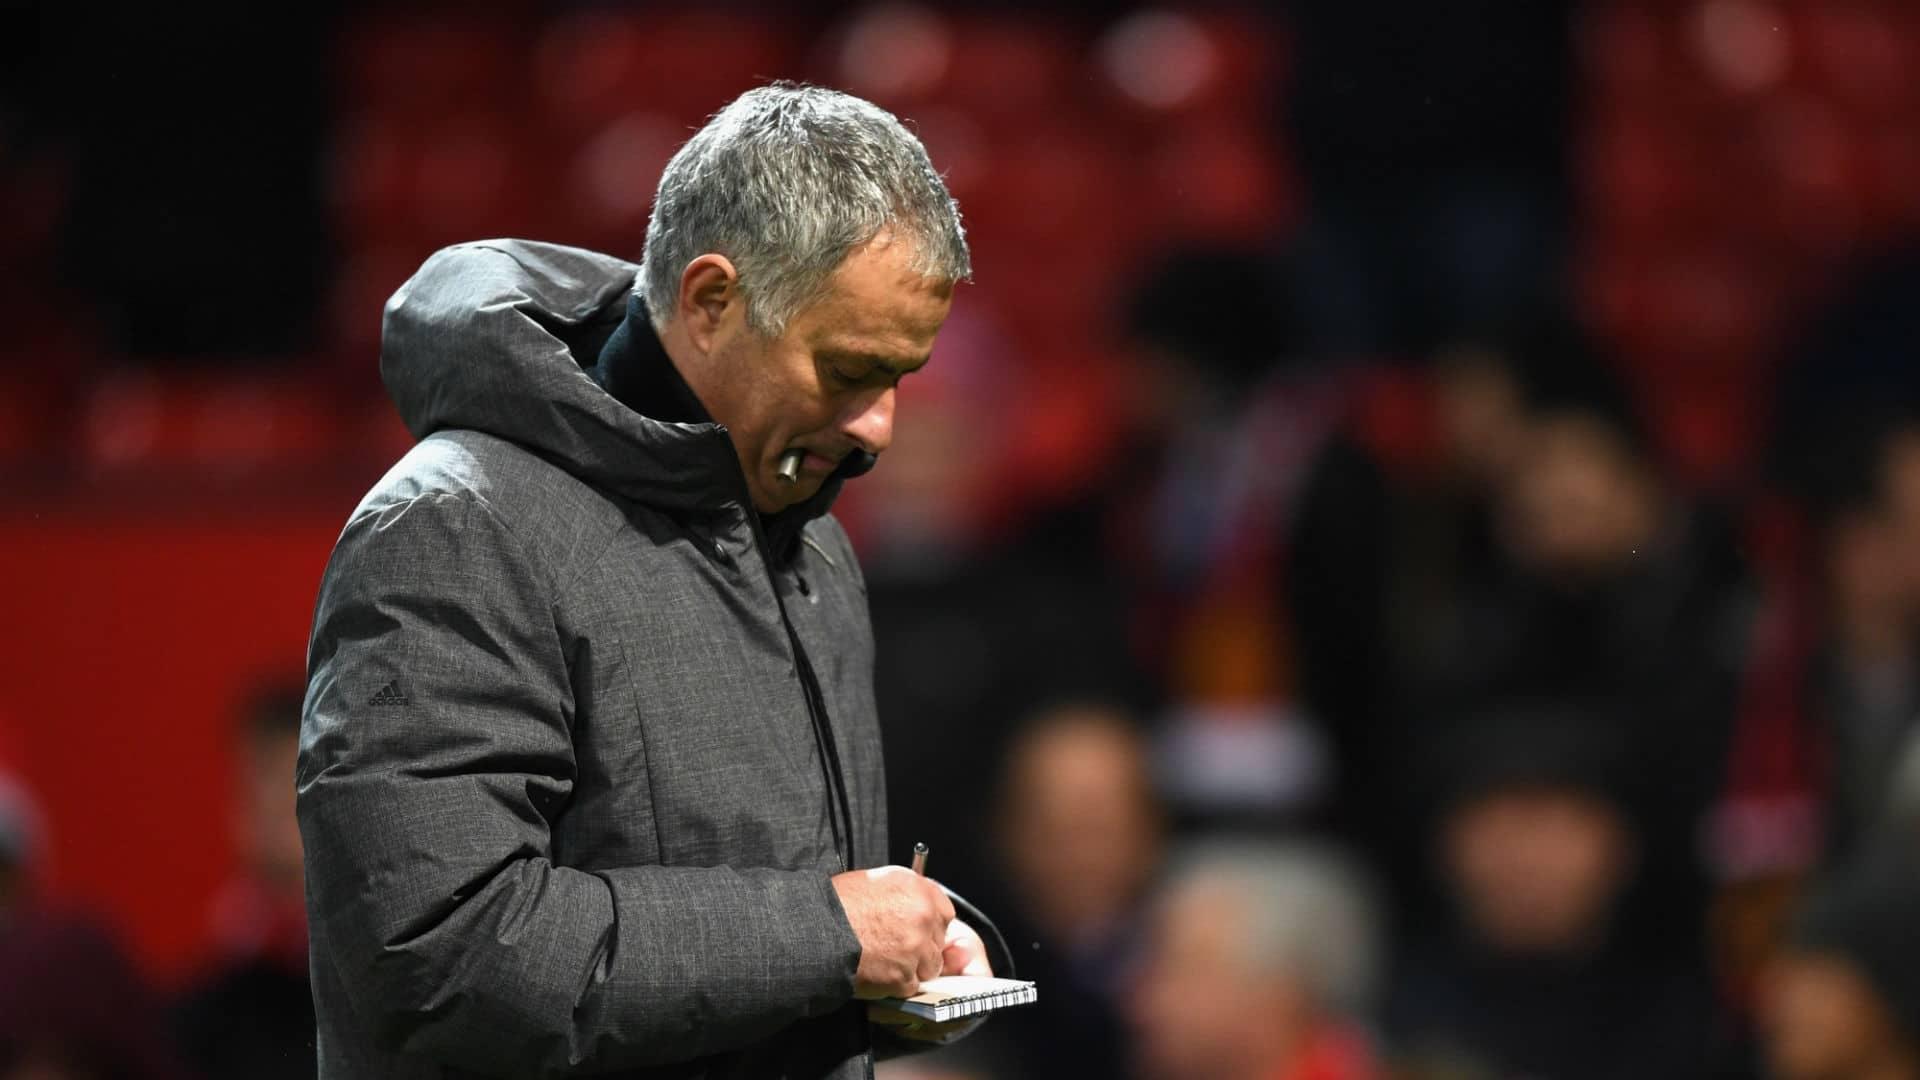 Jose Mourinho - United